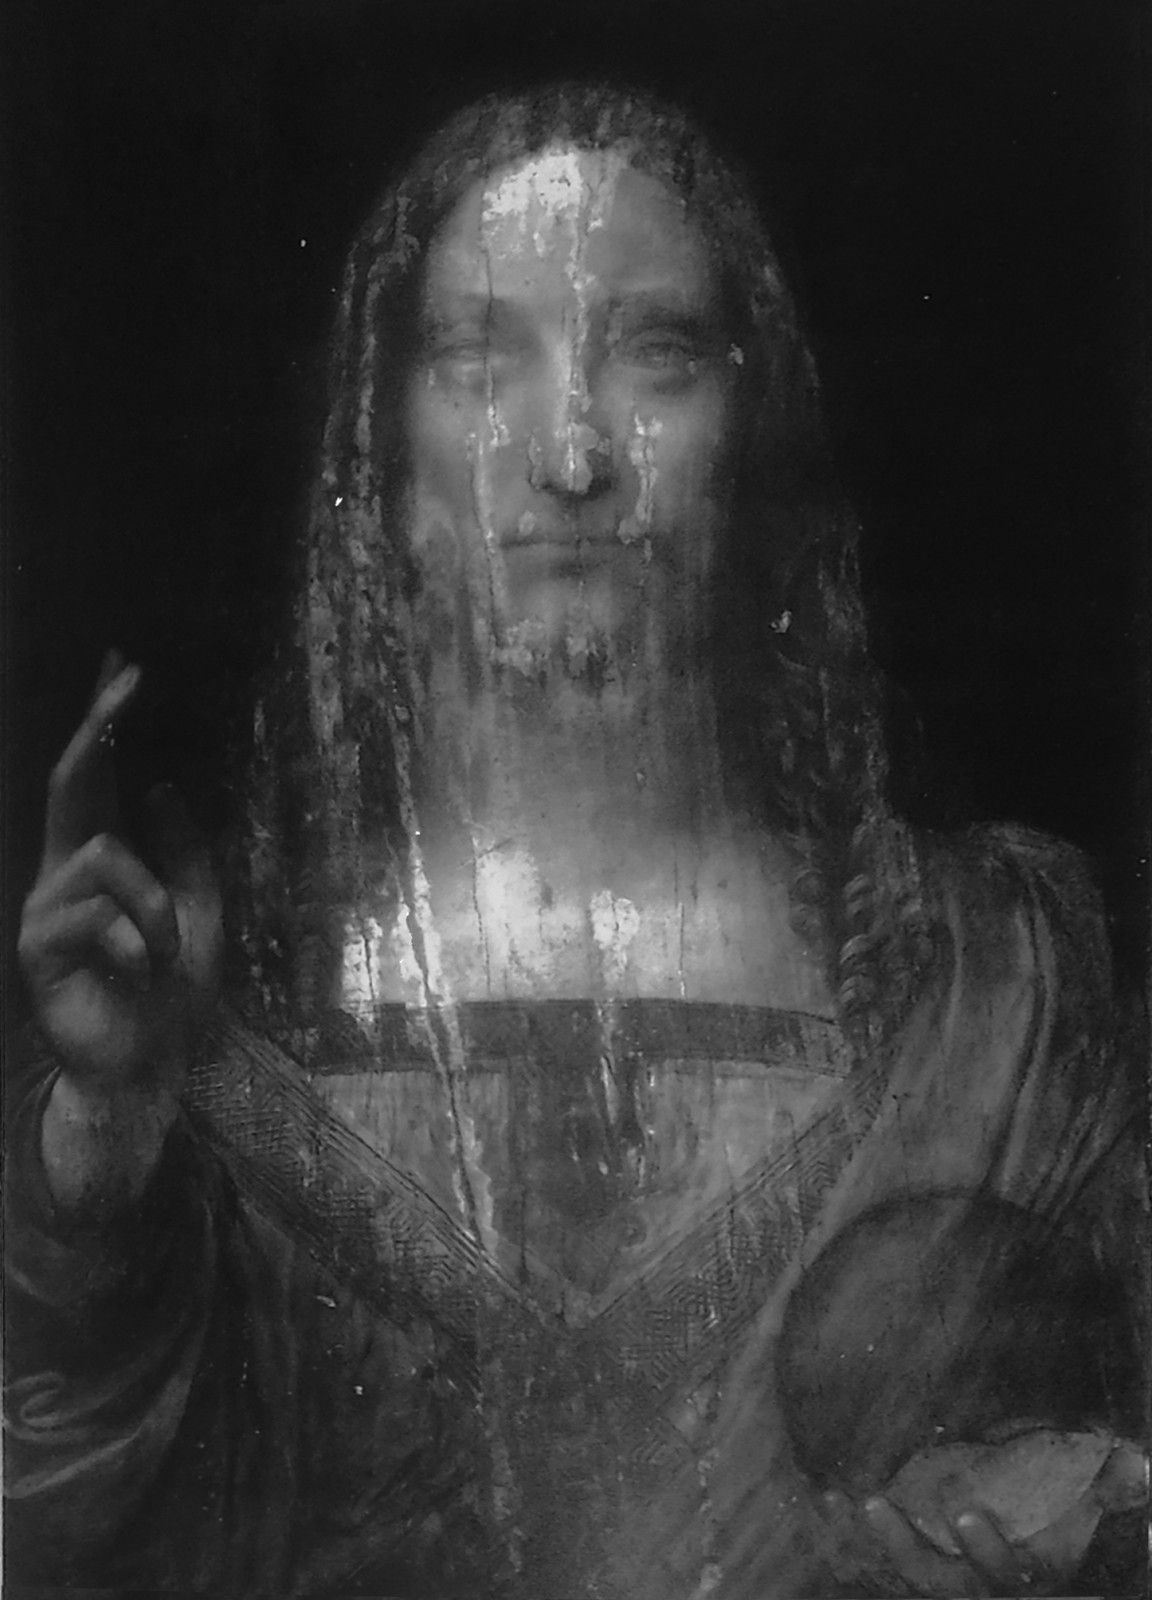 Leonardo Da Vinci, Salvator Mundi, Infra-Red Reflectography